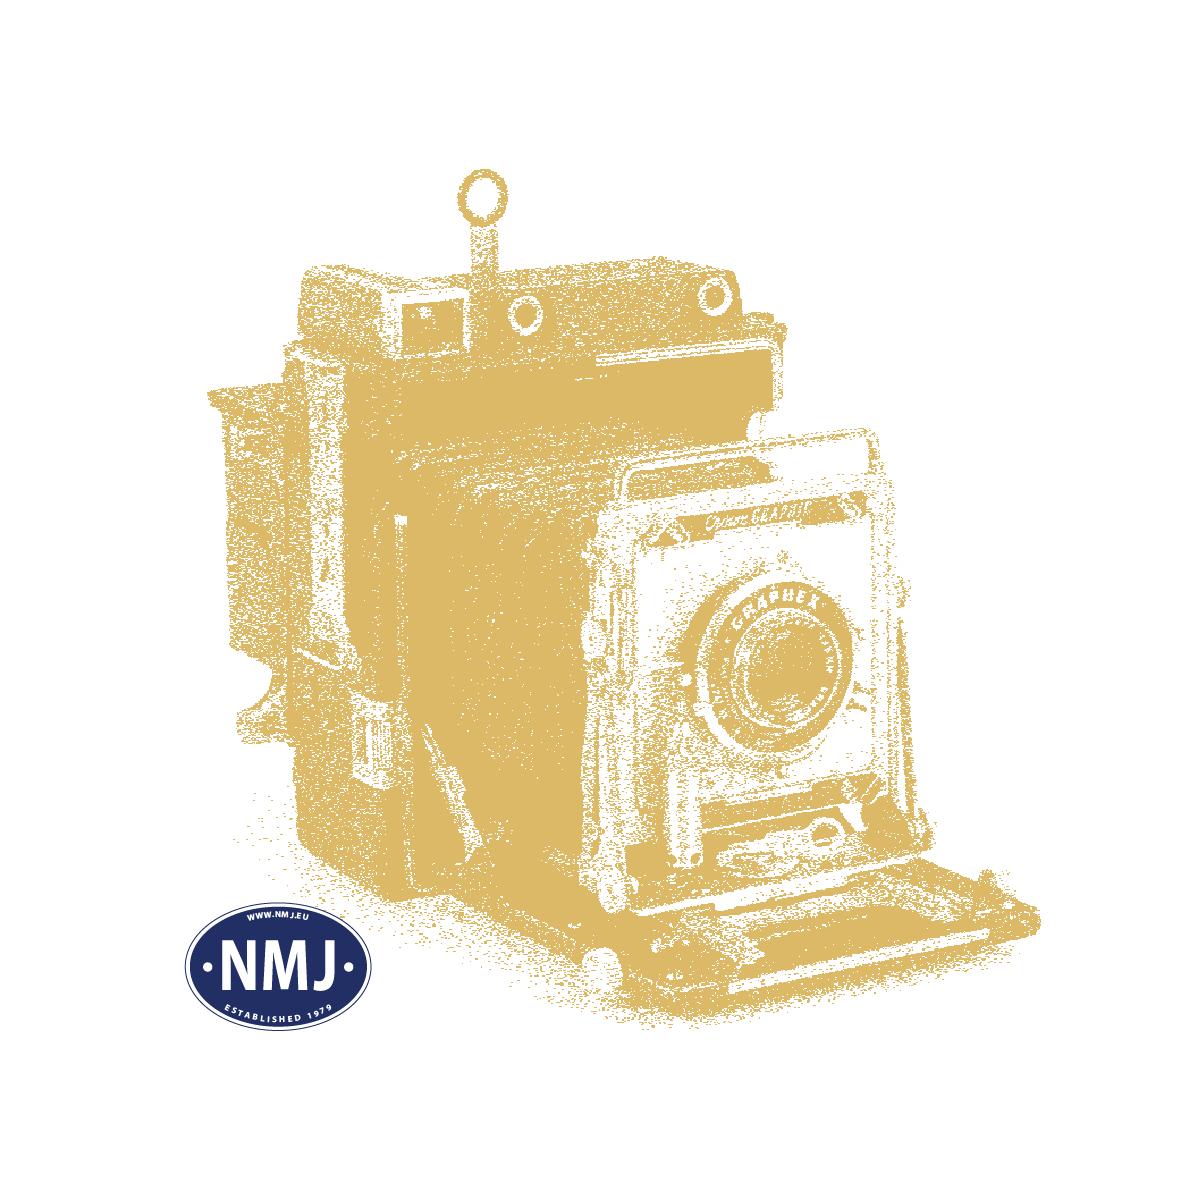 NMJT113.501 - NMJ Topline NSB CB1 21219, rot/silber/grau